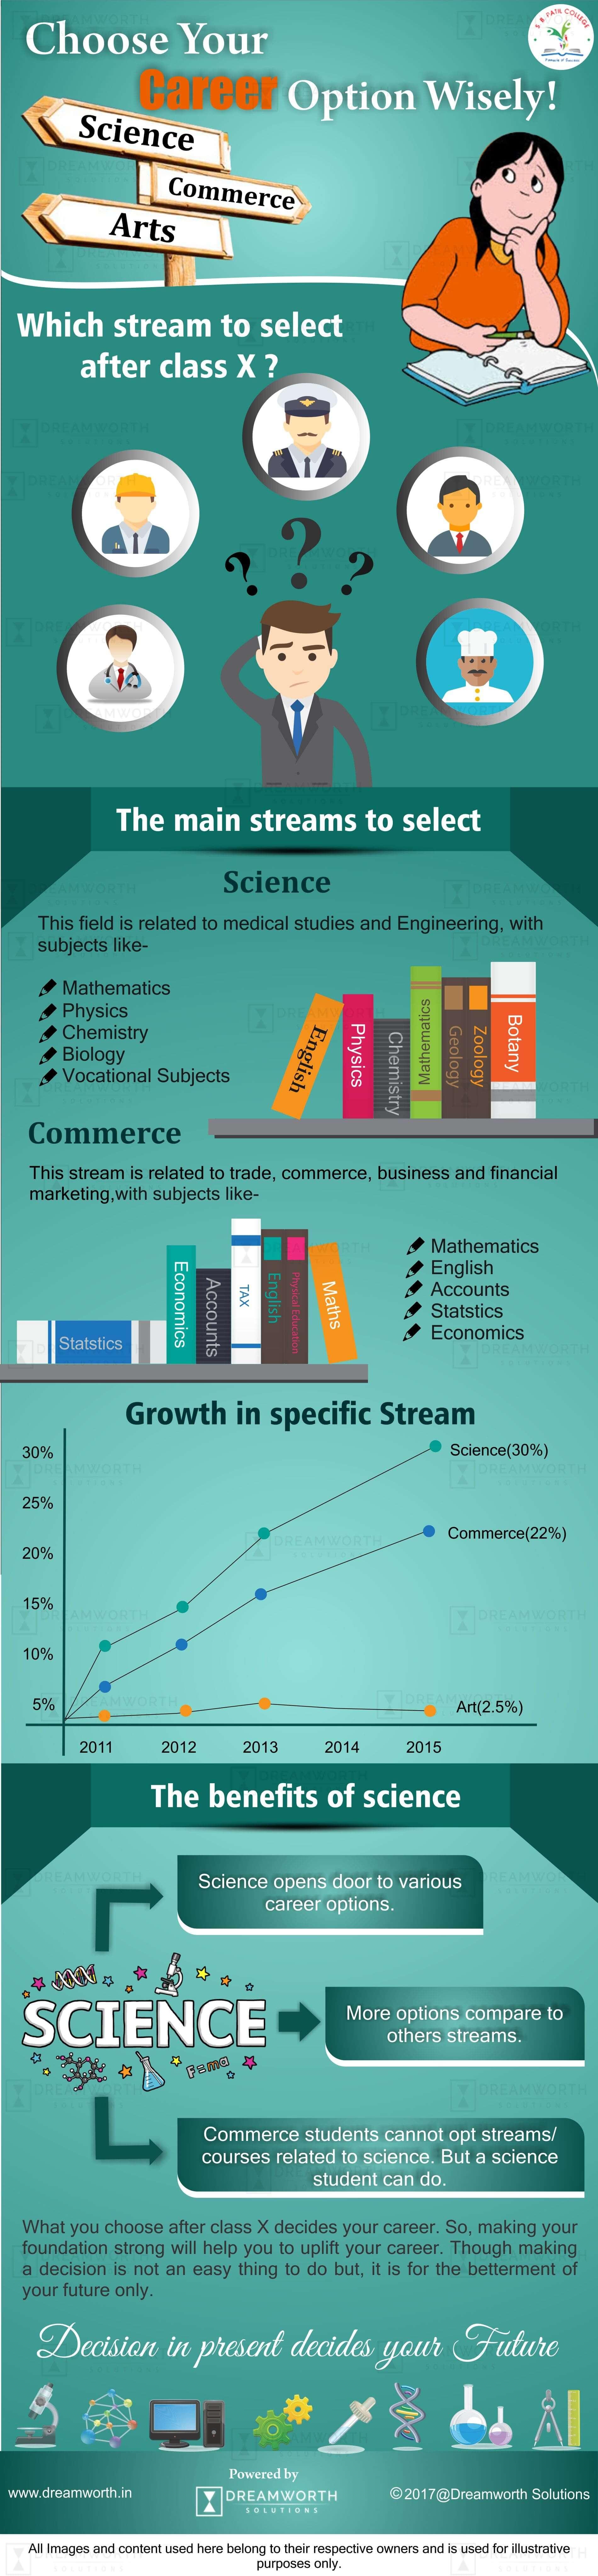 digital marketing service provider pune